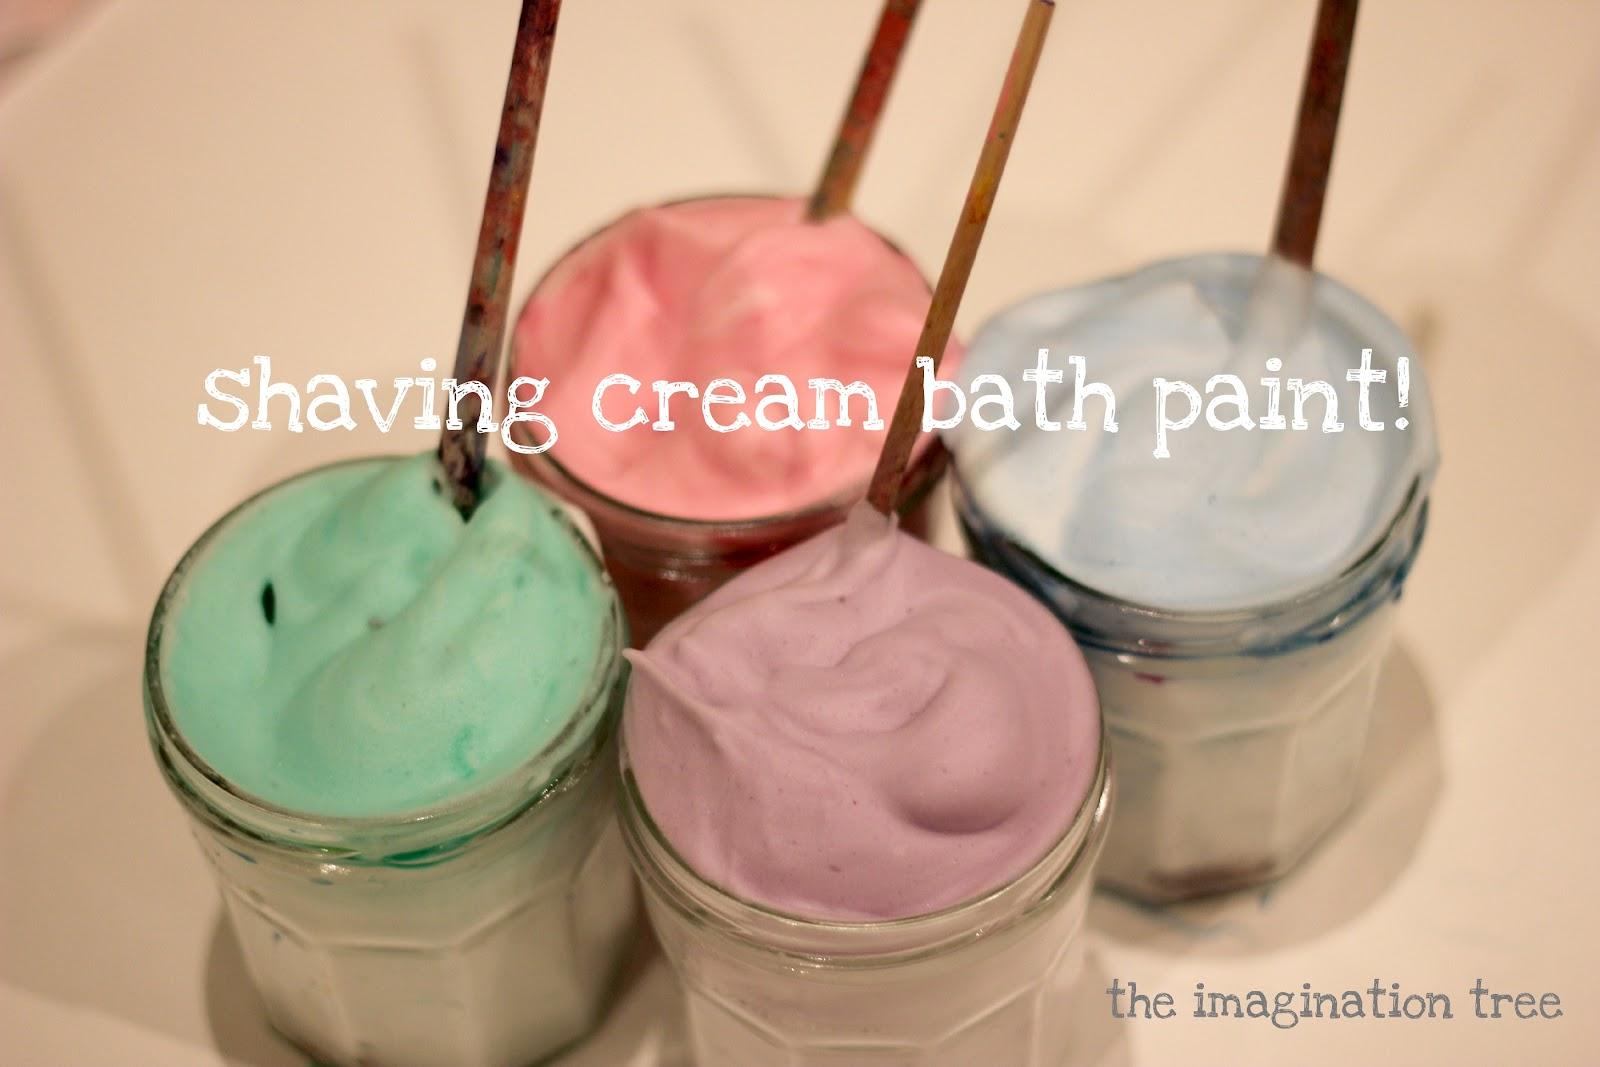 Shaving cream bath paint the imagination tree for Shaving cream paint